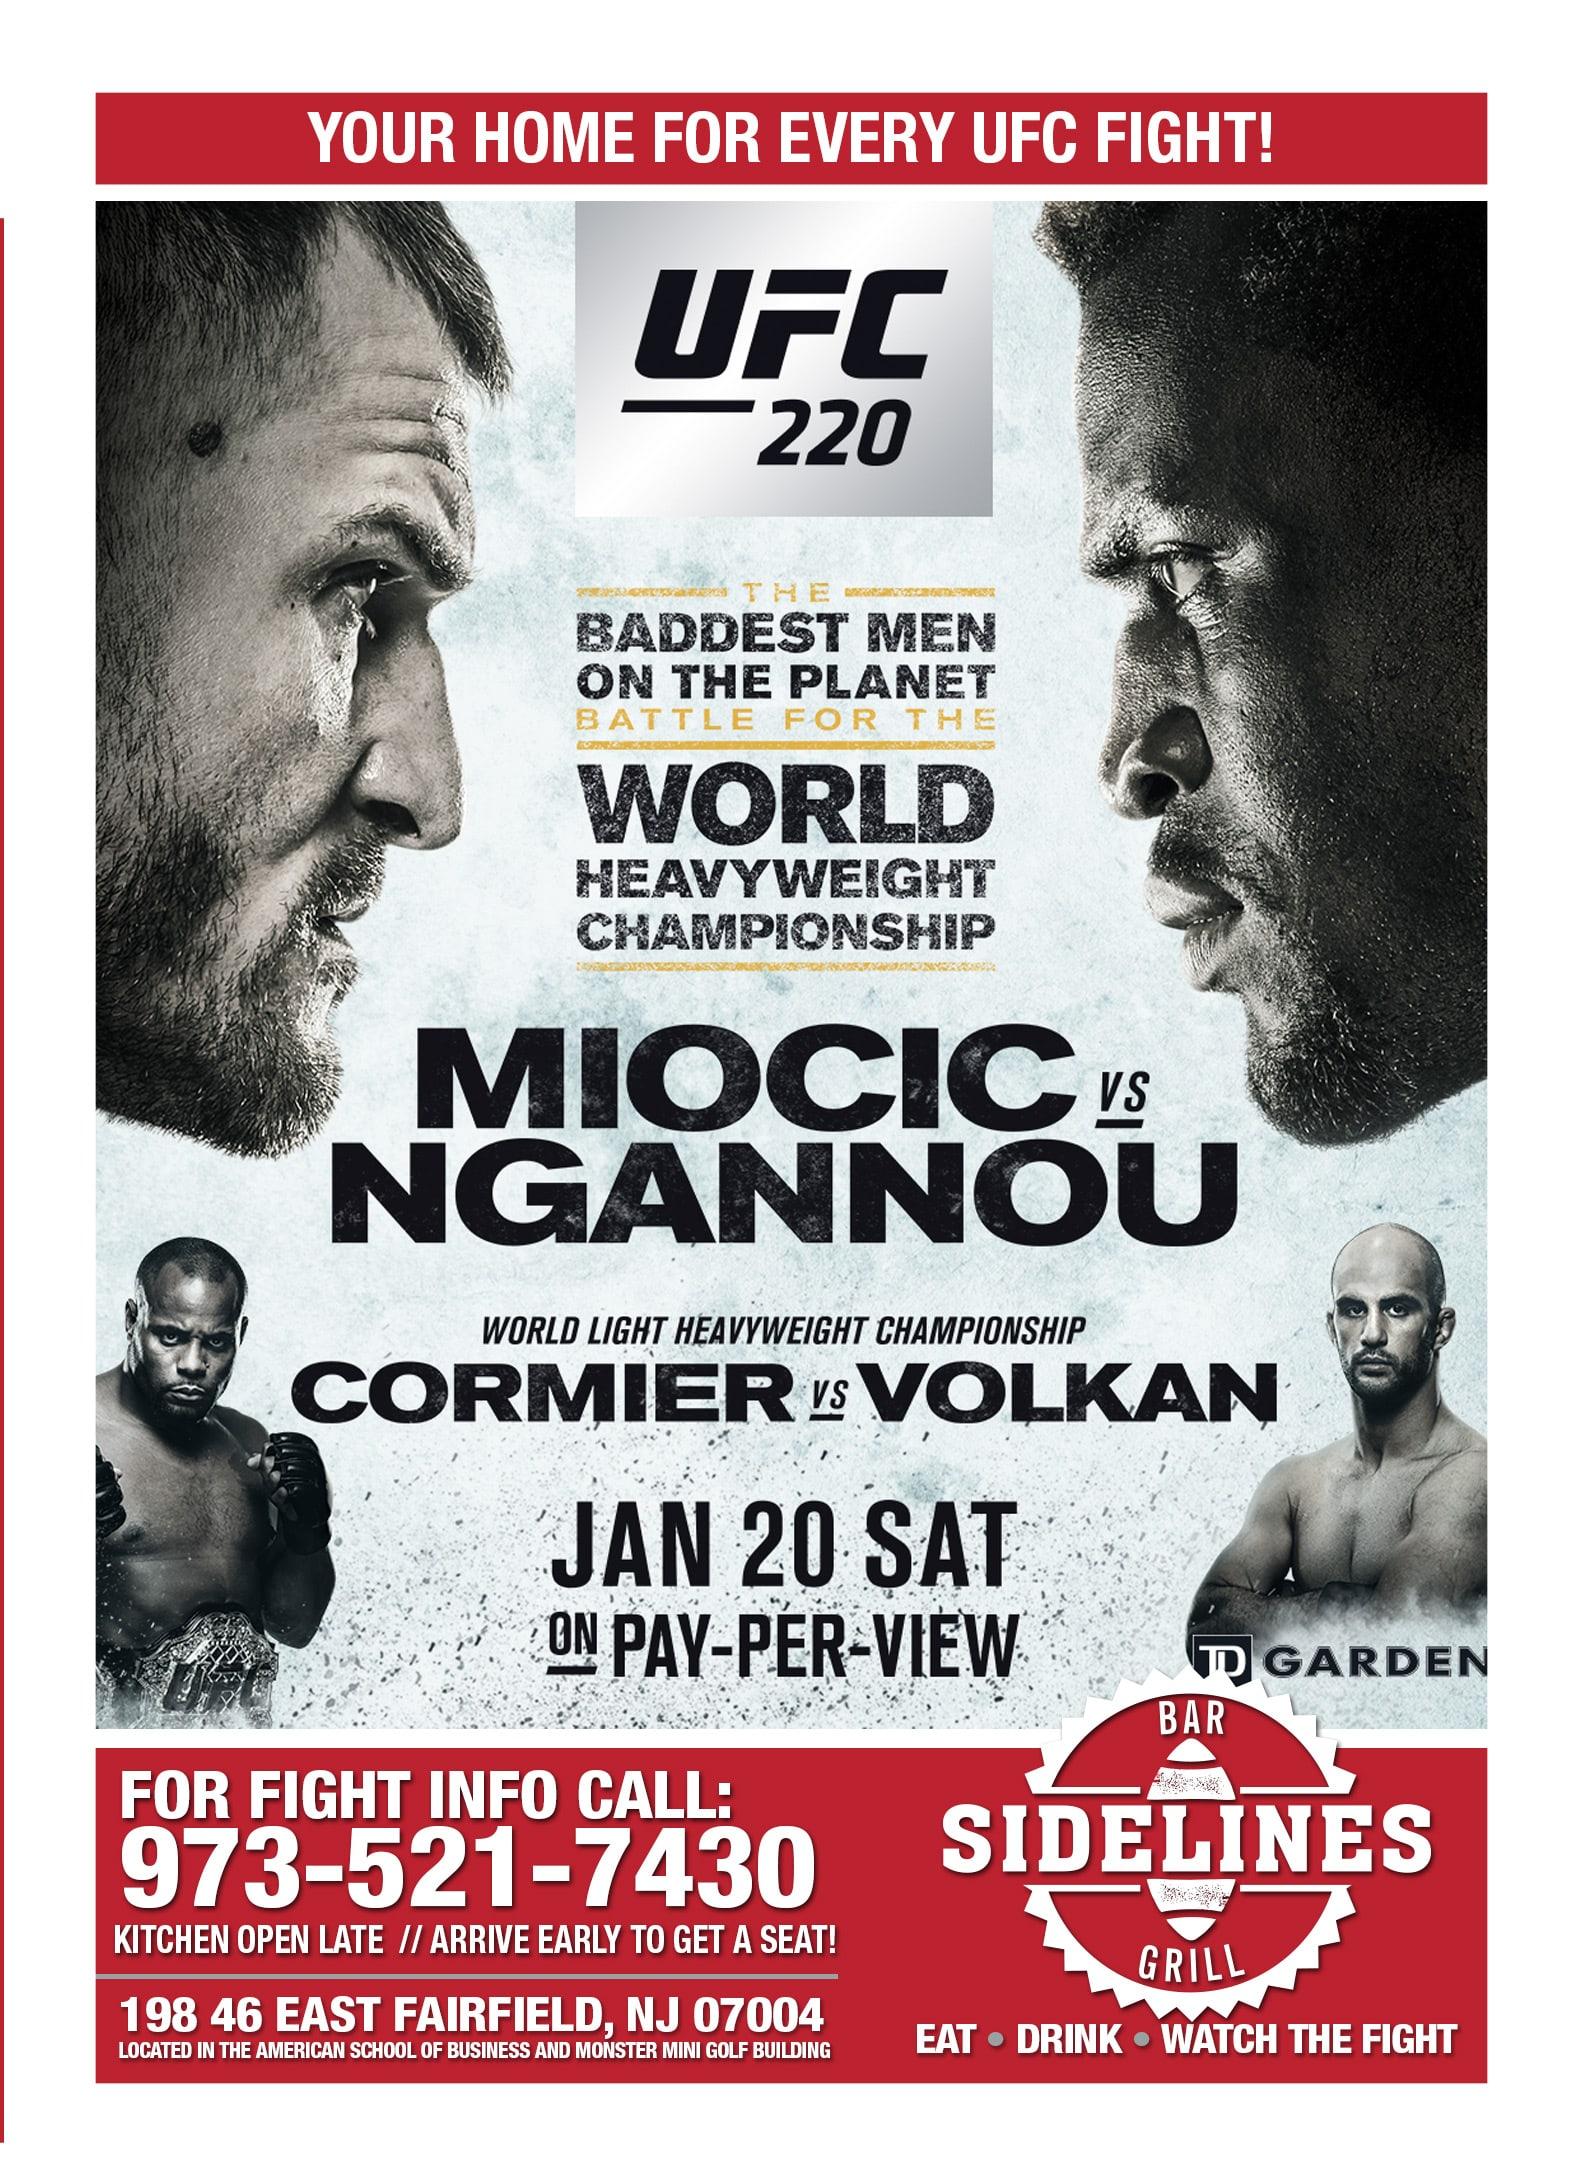 Sidelines_UFC220_5x7_AD-min.jpg